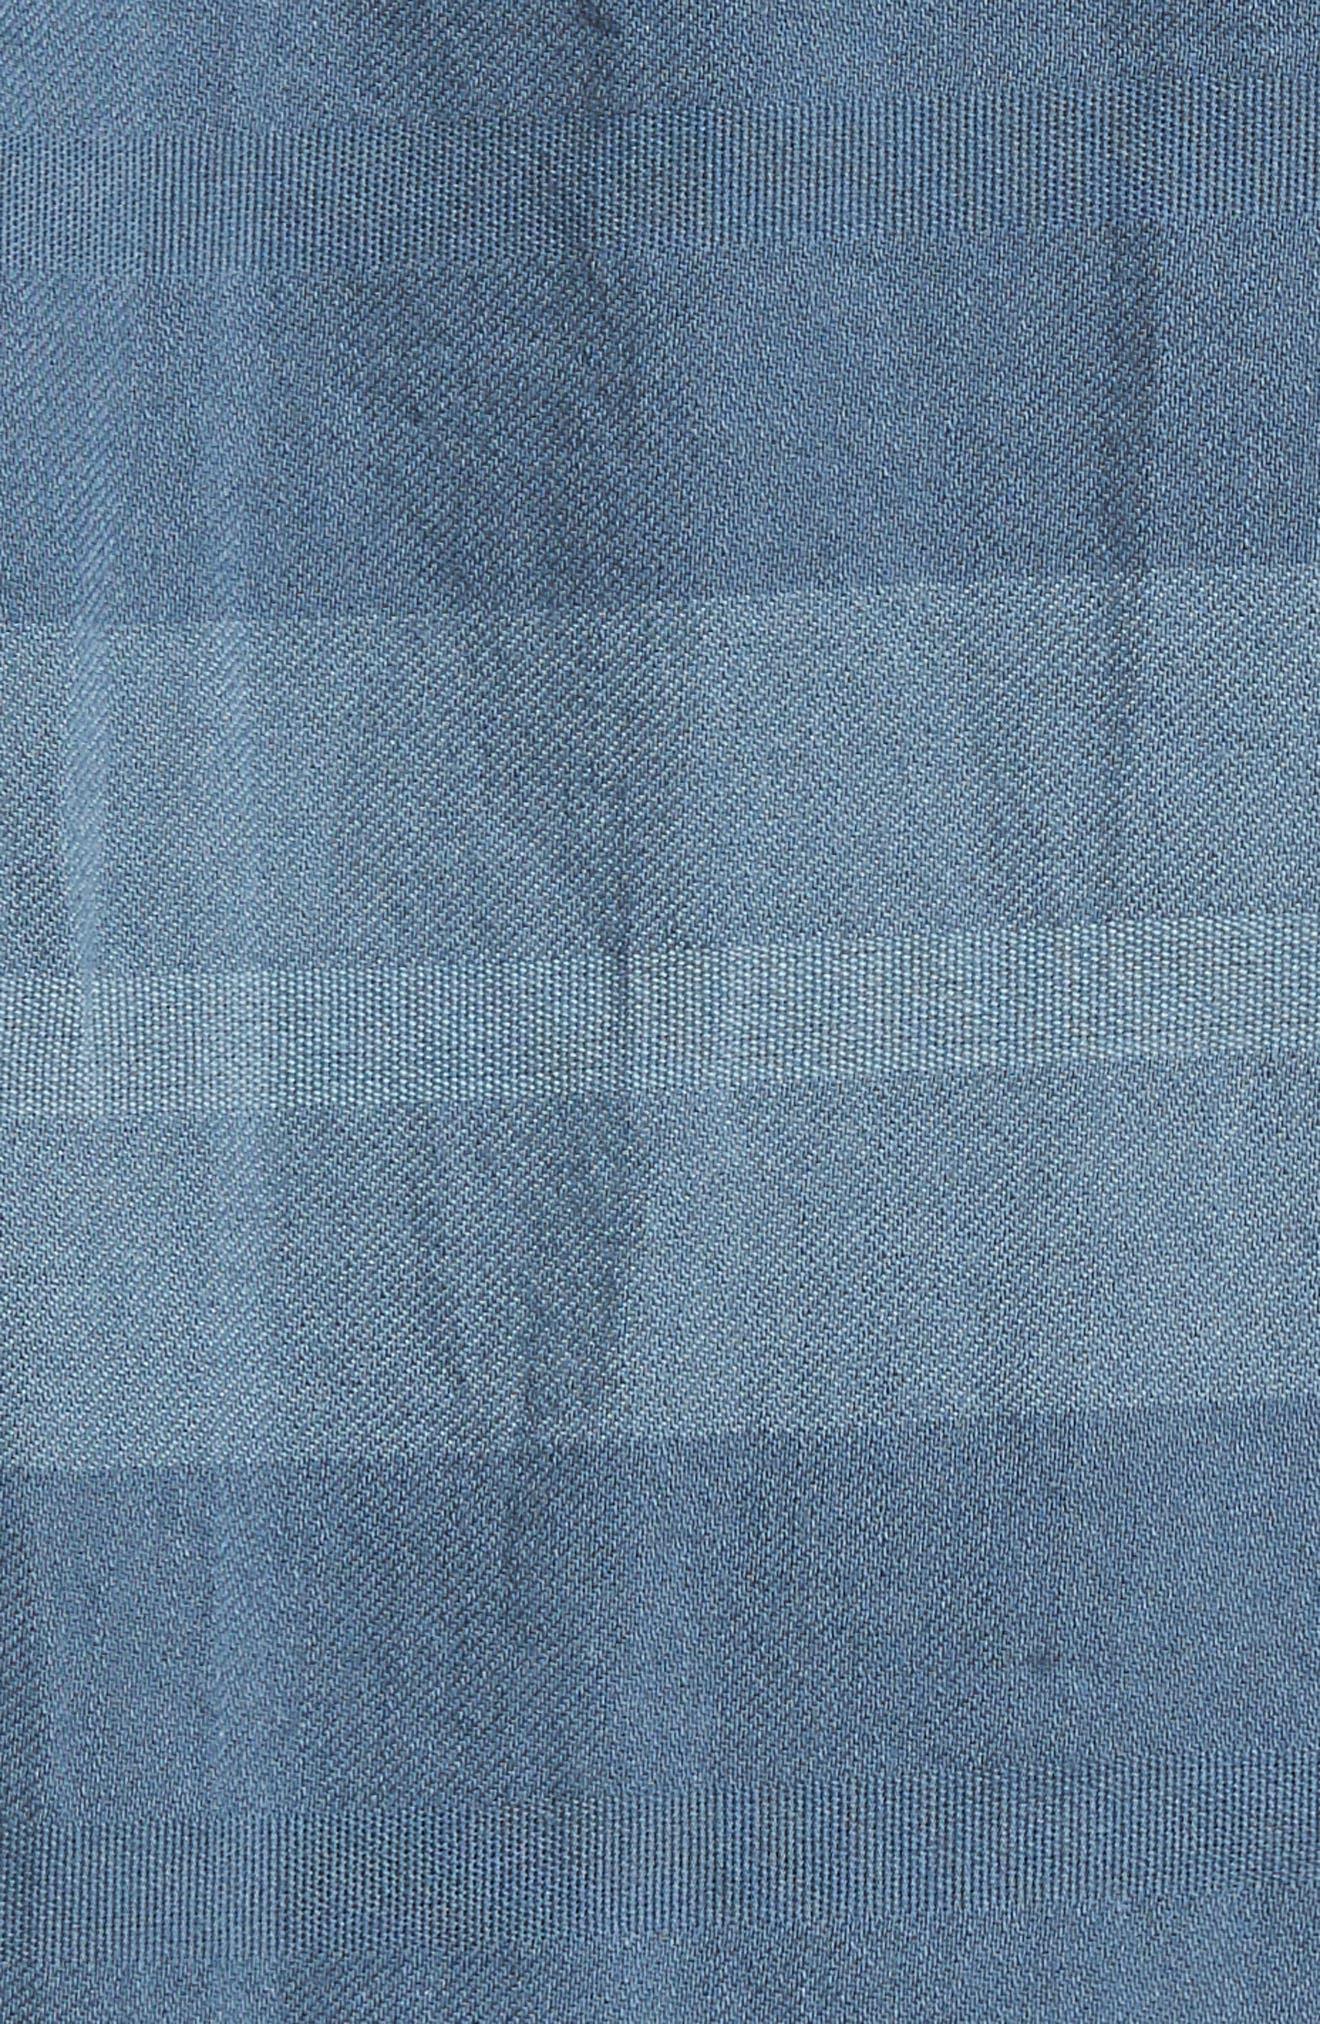 Dobson Woven Shirt,                             Alternate thumbnail 5, color,                             Storm Blue/Prison Blue Stripe